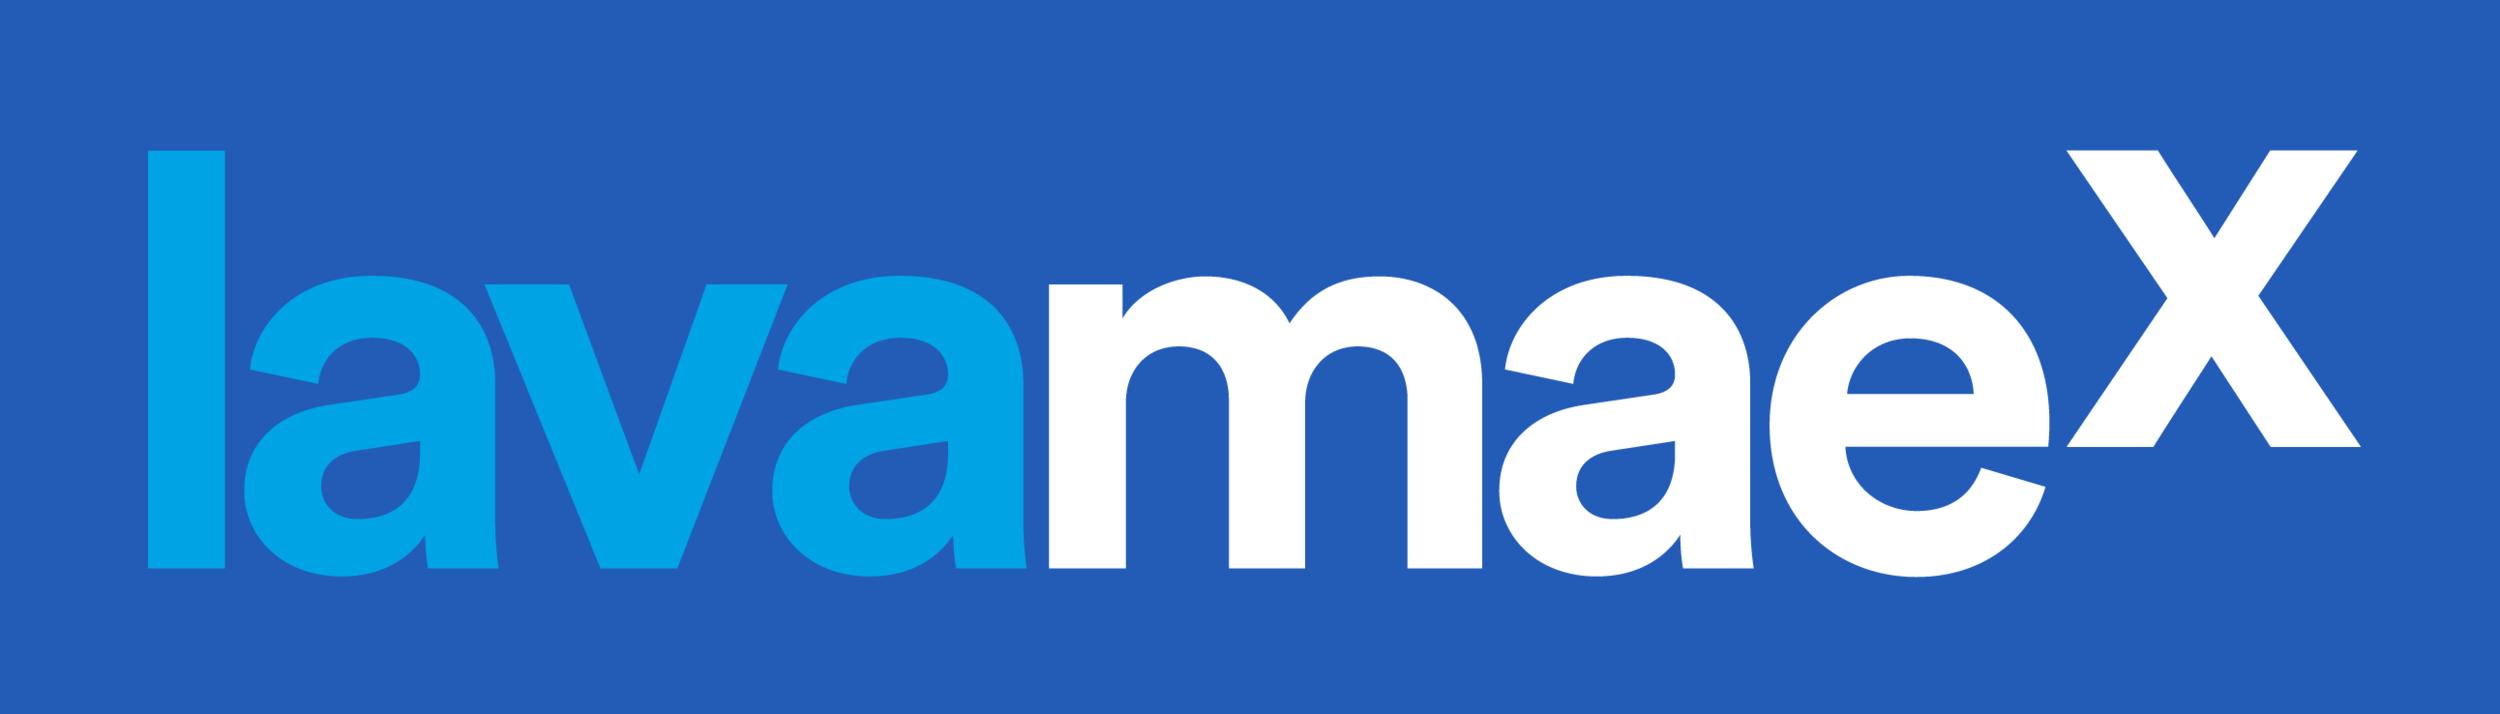 LavaMaeX_Logo_Primary-03.png